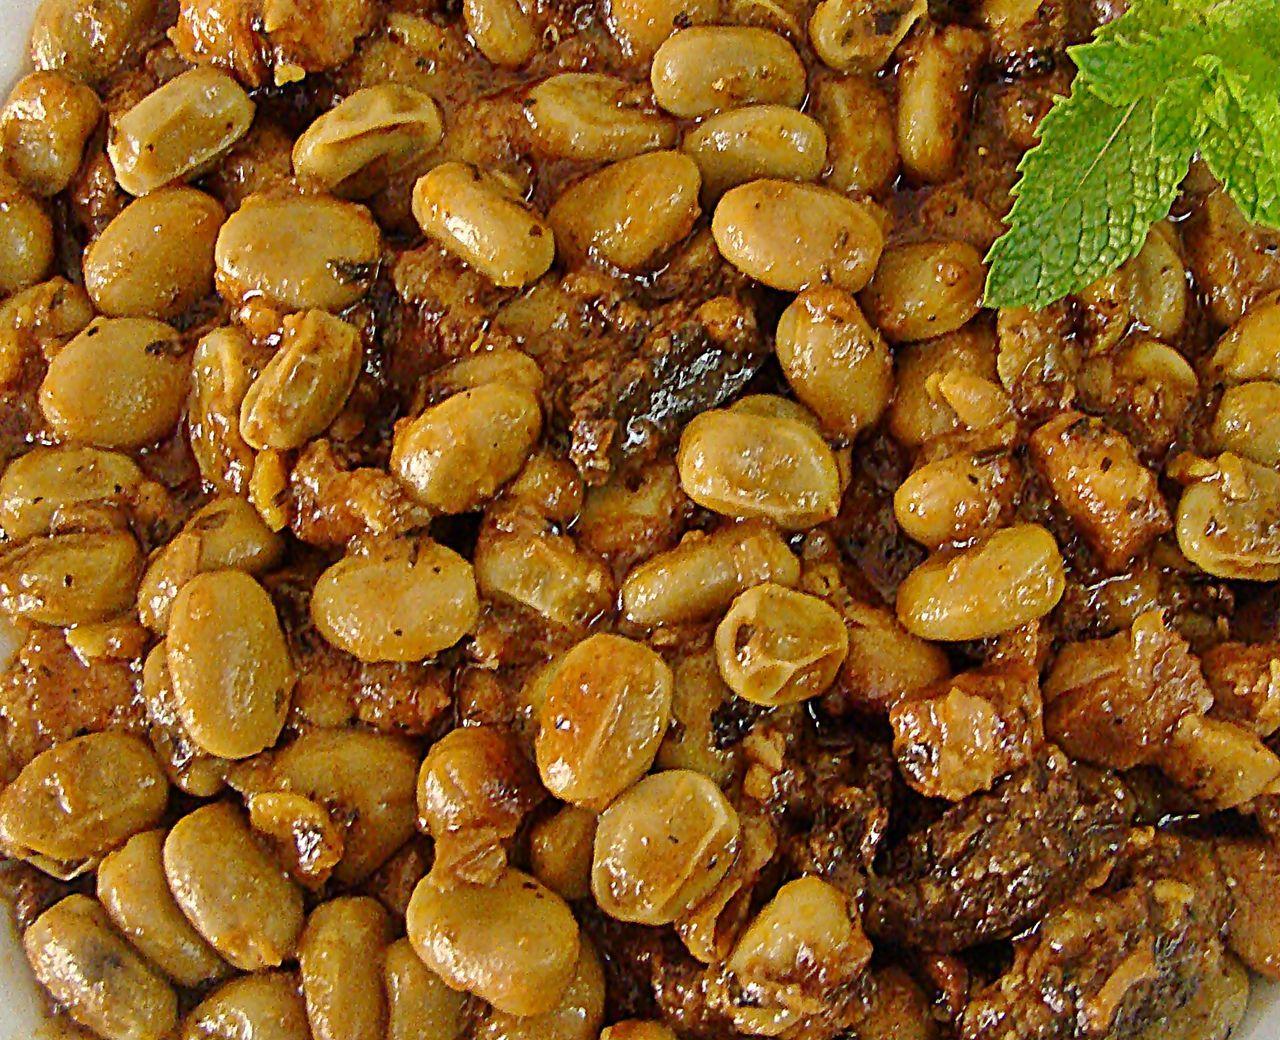 Creatividad Dali Figueres Dalí Esposicion Fotografia Jrosillo Srt Visual ImpactRestaurante figueres Foodphotography foodspain Costa Brava, Coast